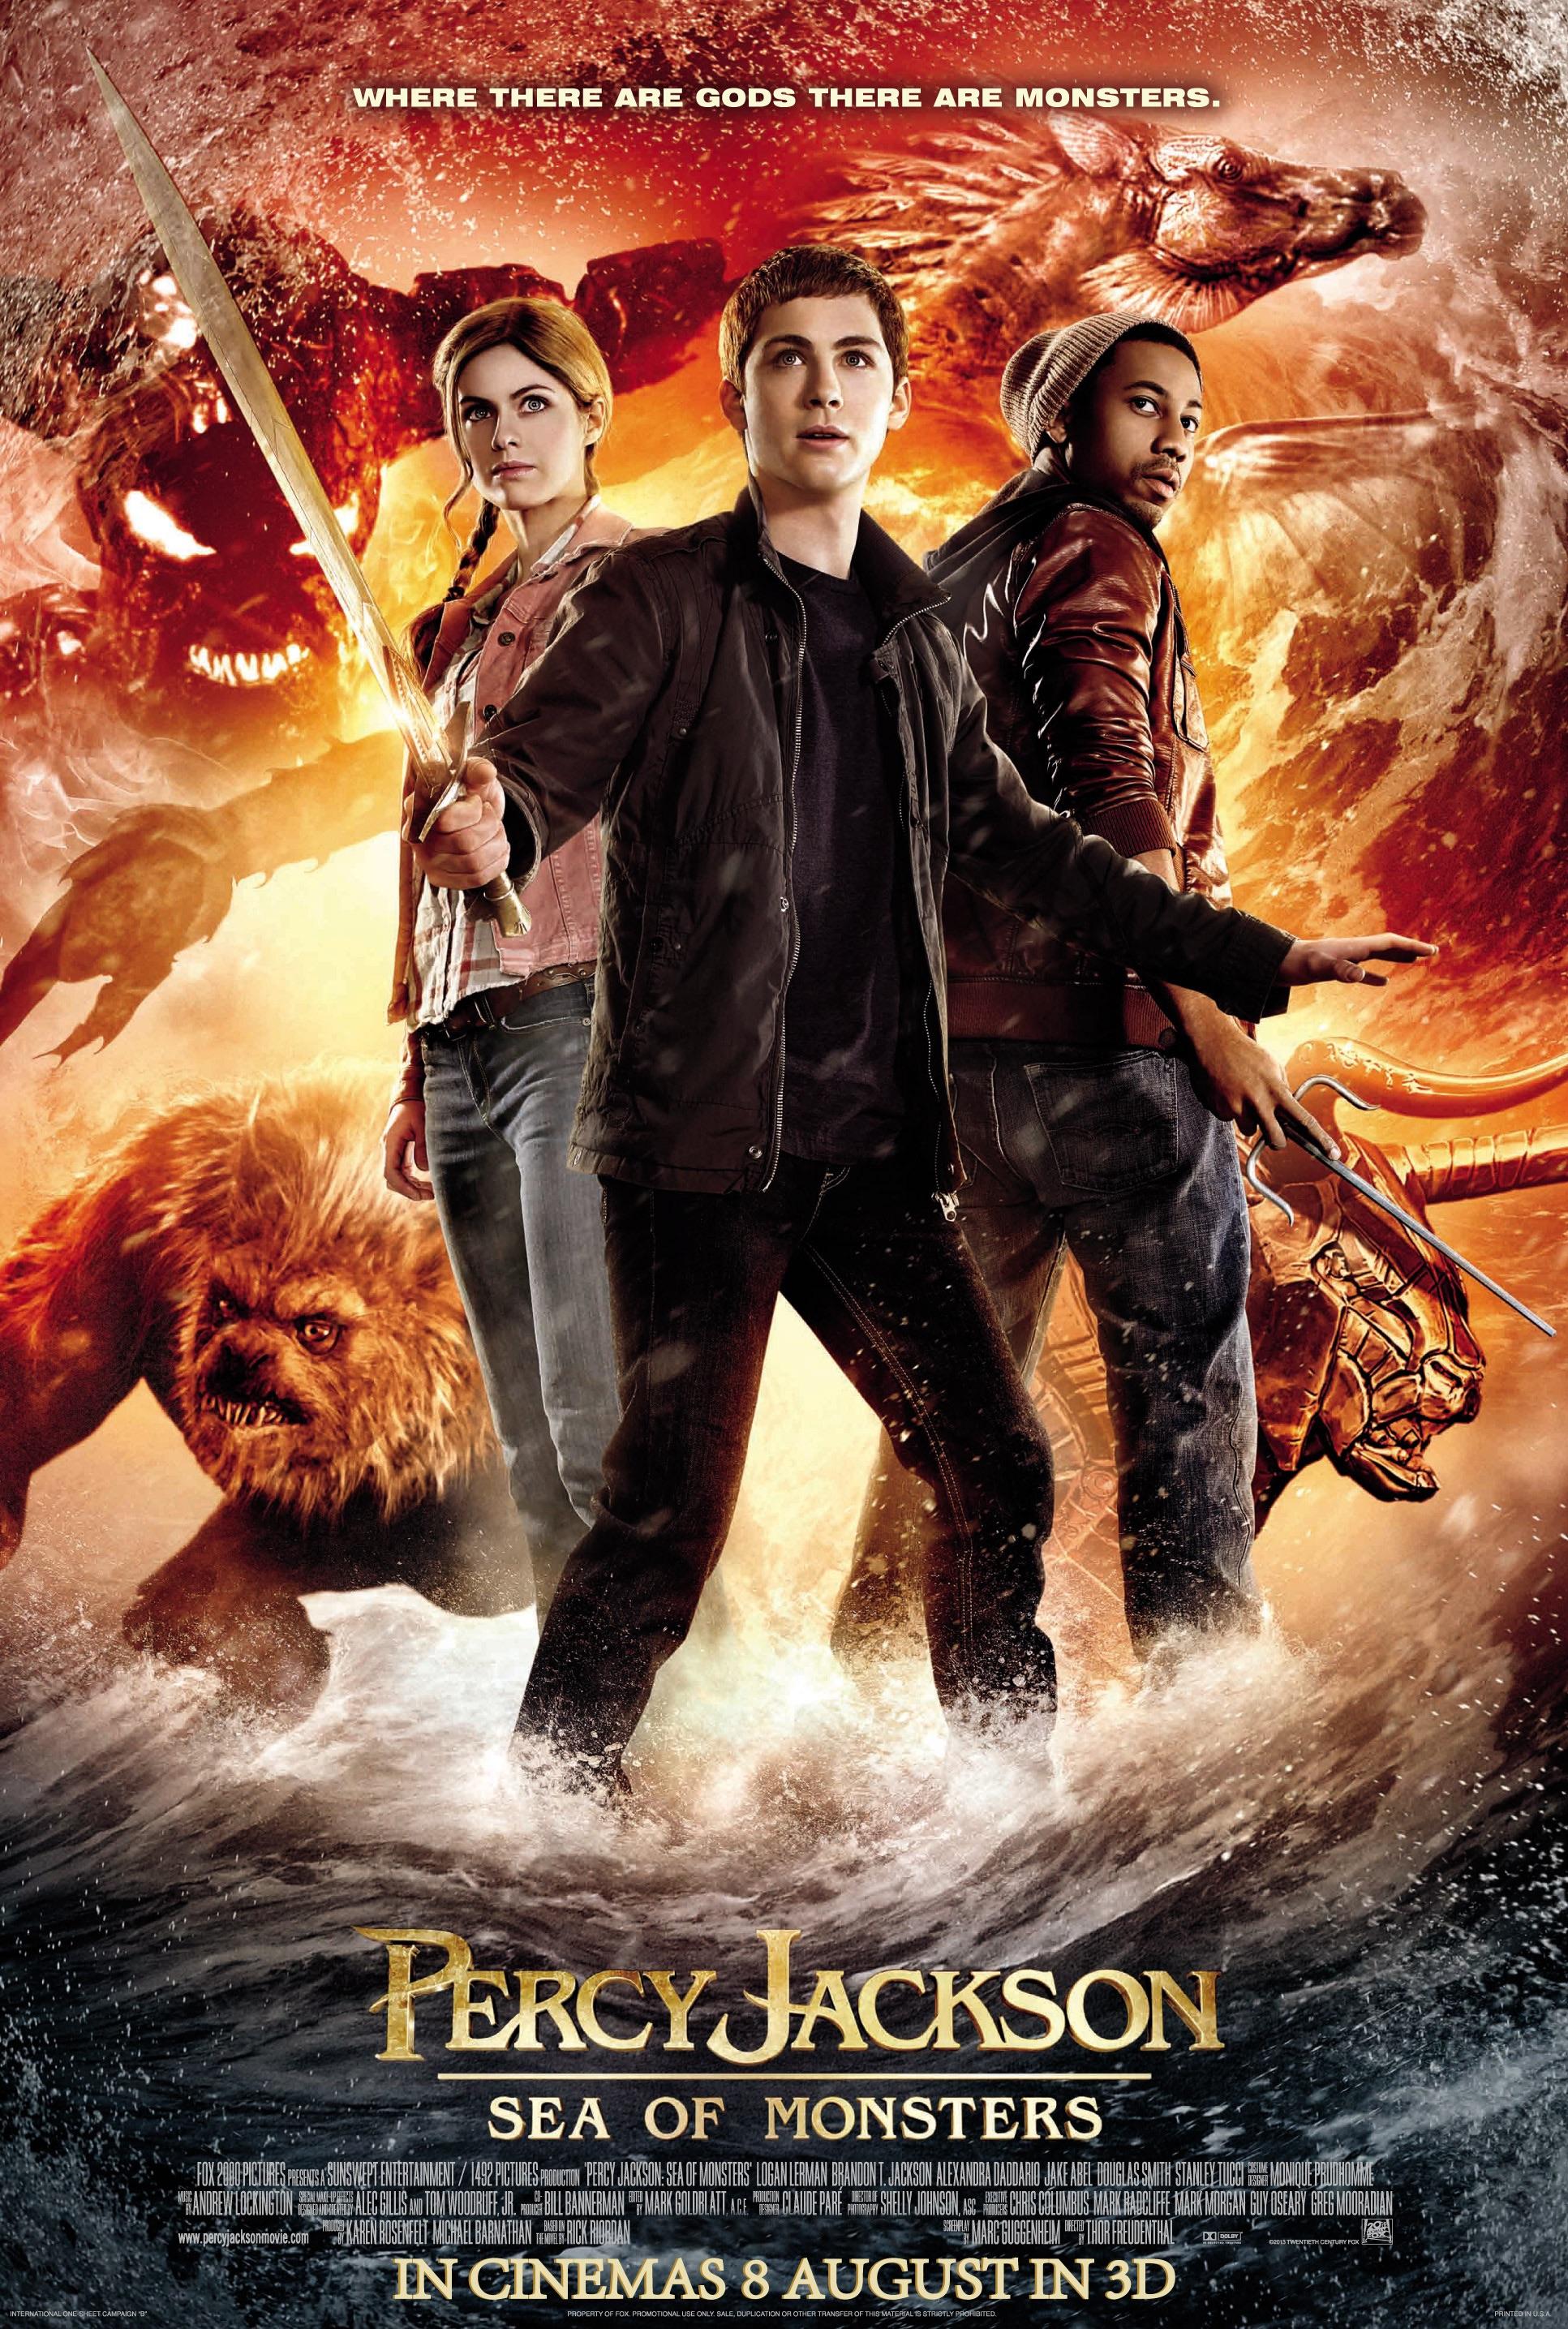 PERCY JACKSON Biển Quái Vật - Percy Jackson: Sea Of Monsters